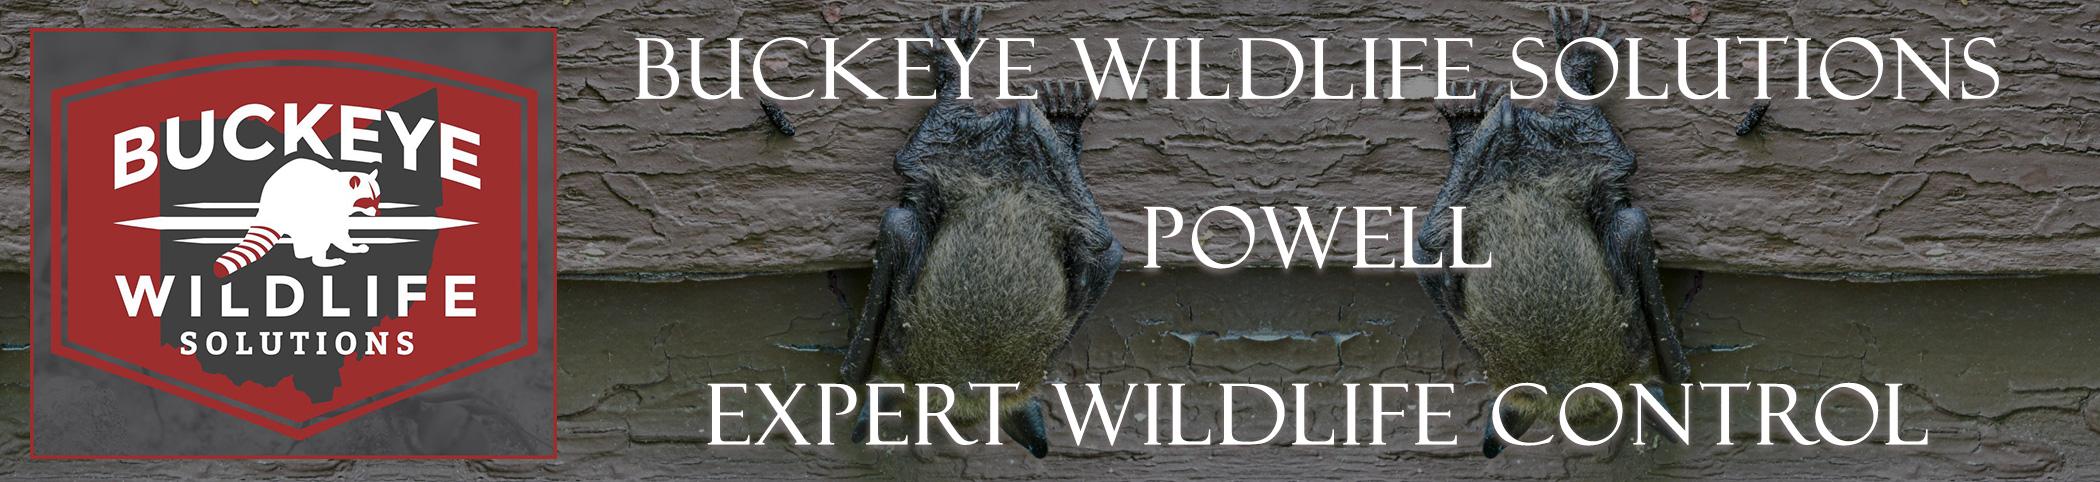 buckeye-wildlife-solutions-Powell-ohio-header-image